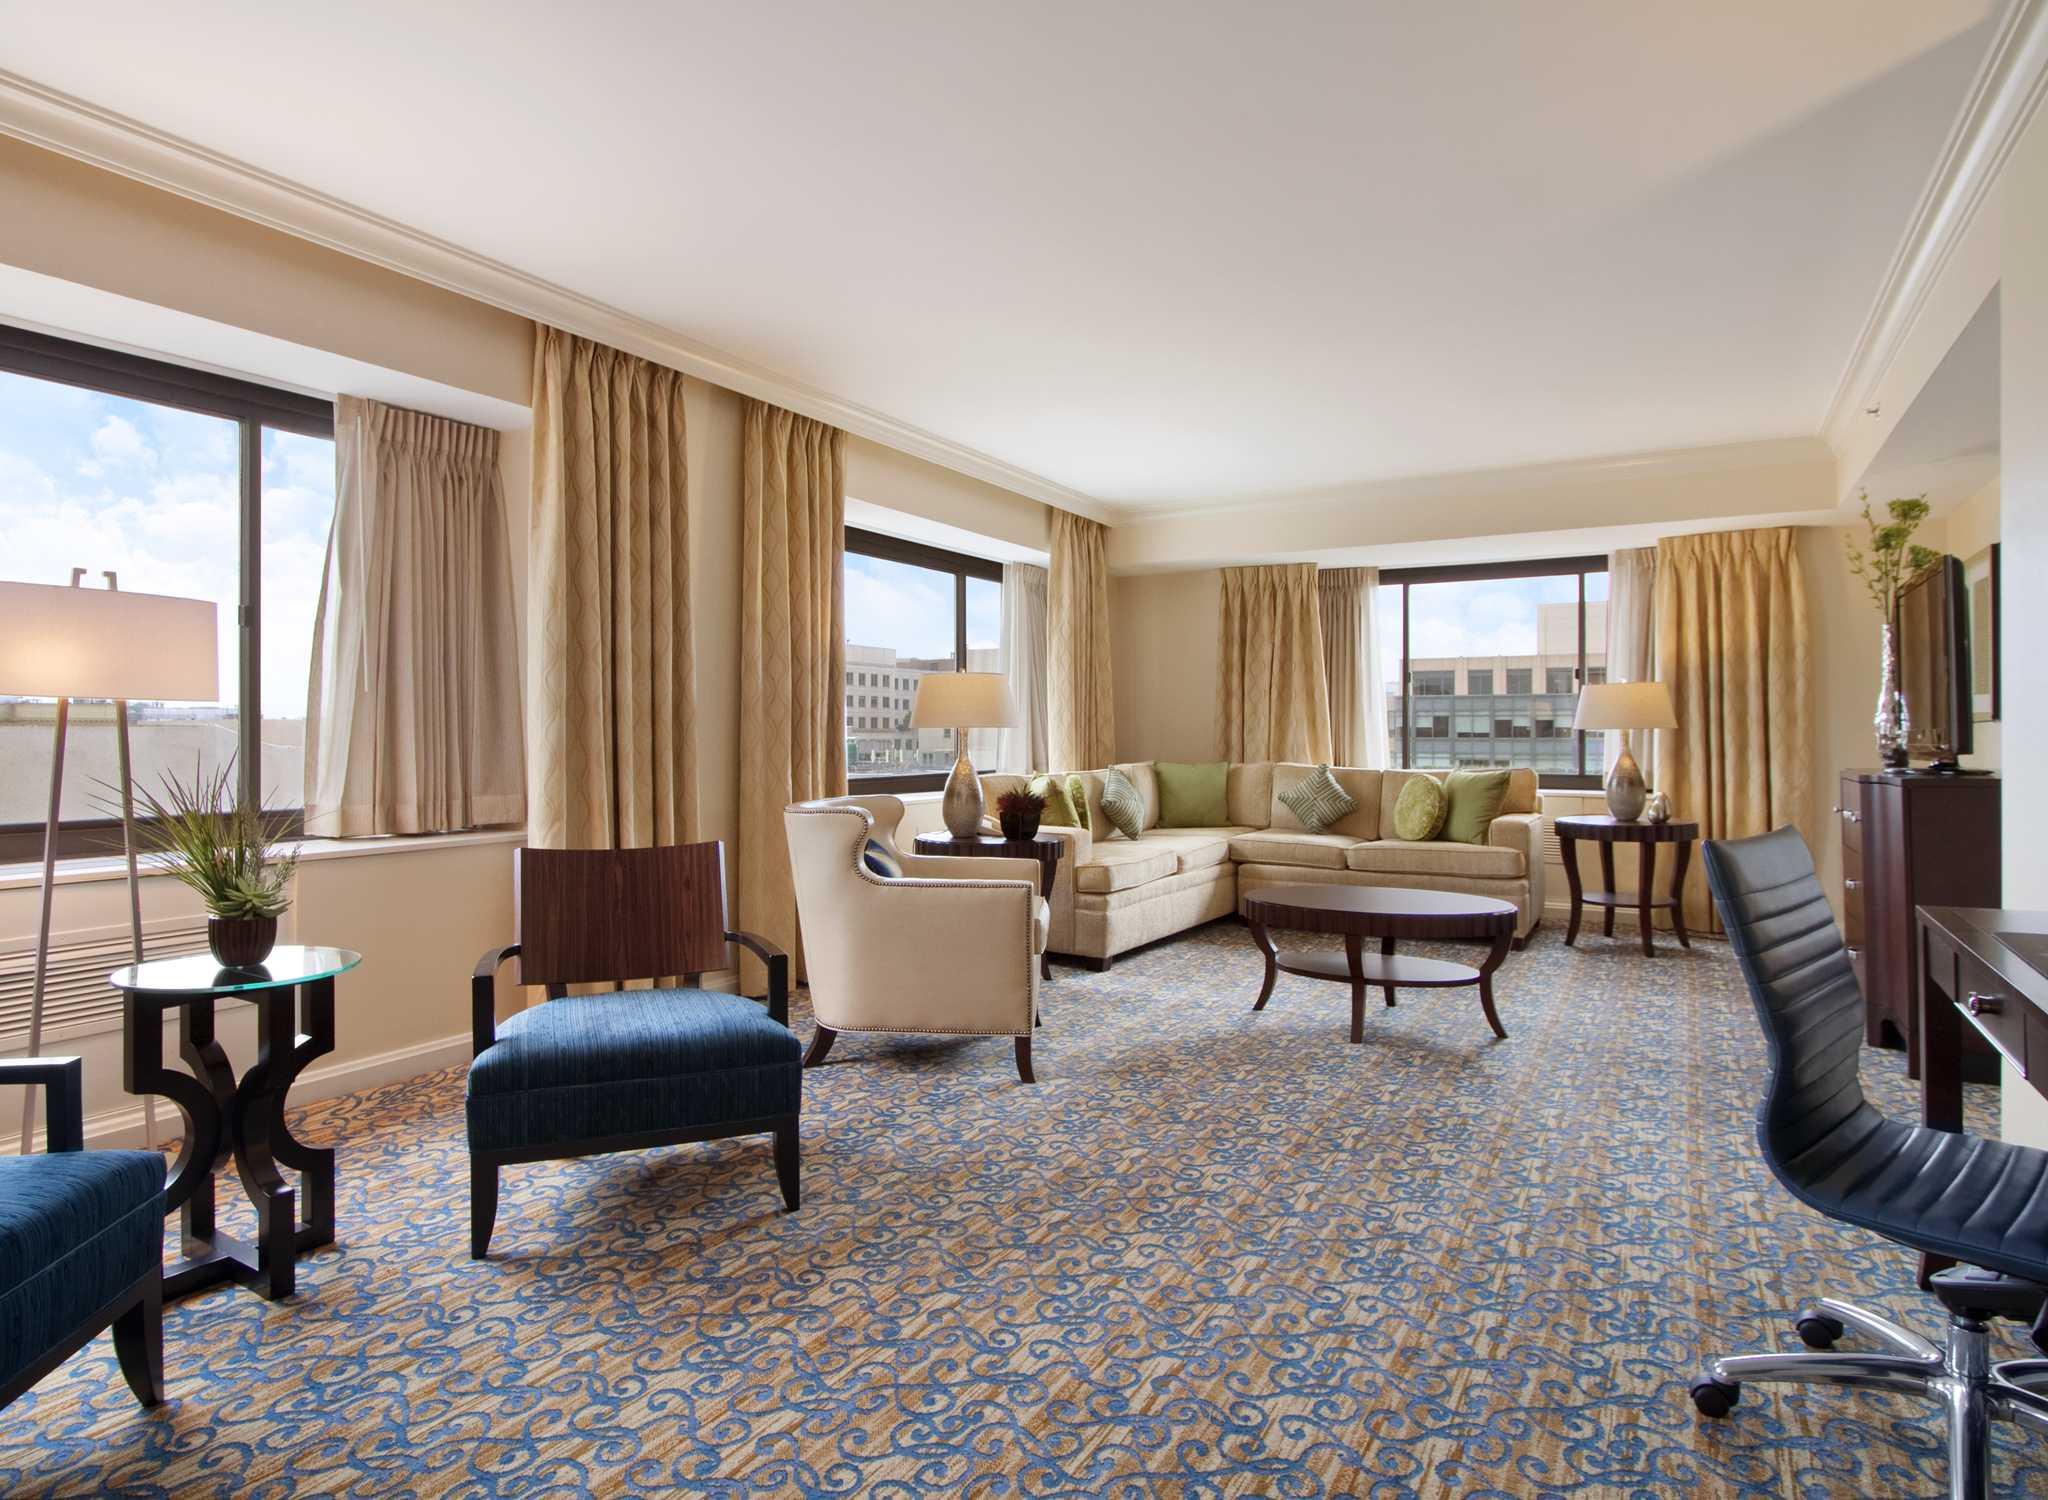 Muebles Hilton Capital Federal Direccion - Hoteles En El Centro De La Ciudad De Washington Dc Hotel De Lujo [mjhdah]http://www.hiltonhotels.com/assets/img/Hotel%20Images/Hilton/D/DCASHHH/DCASHHH_meetings_full_massachusettsroom.jpg